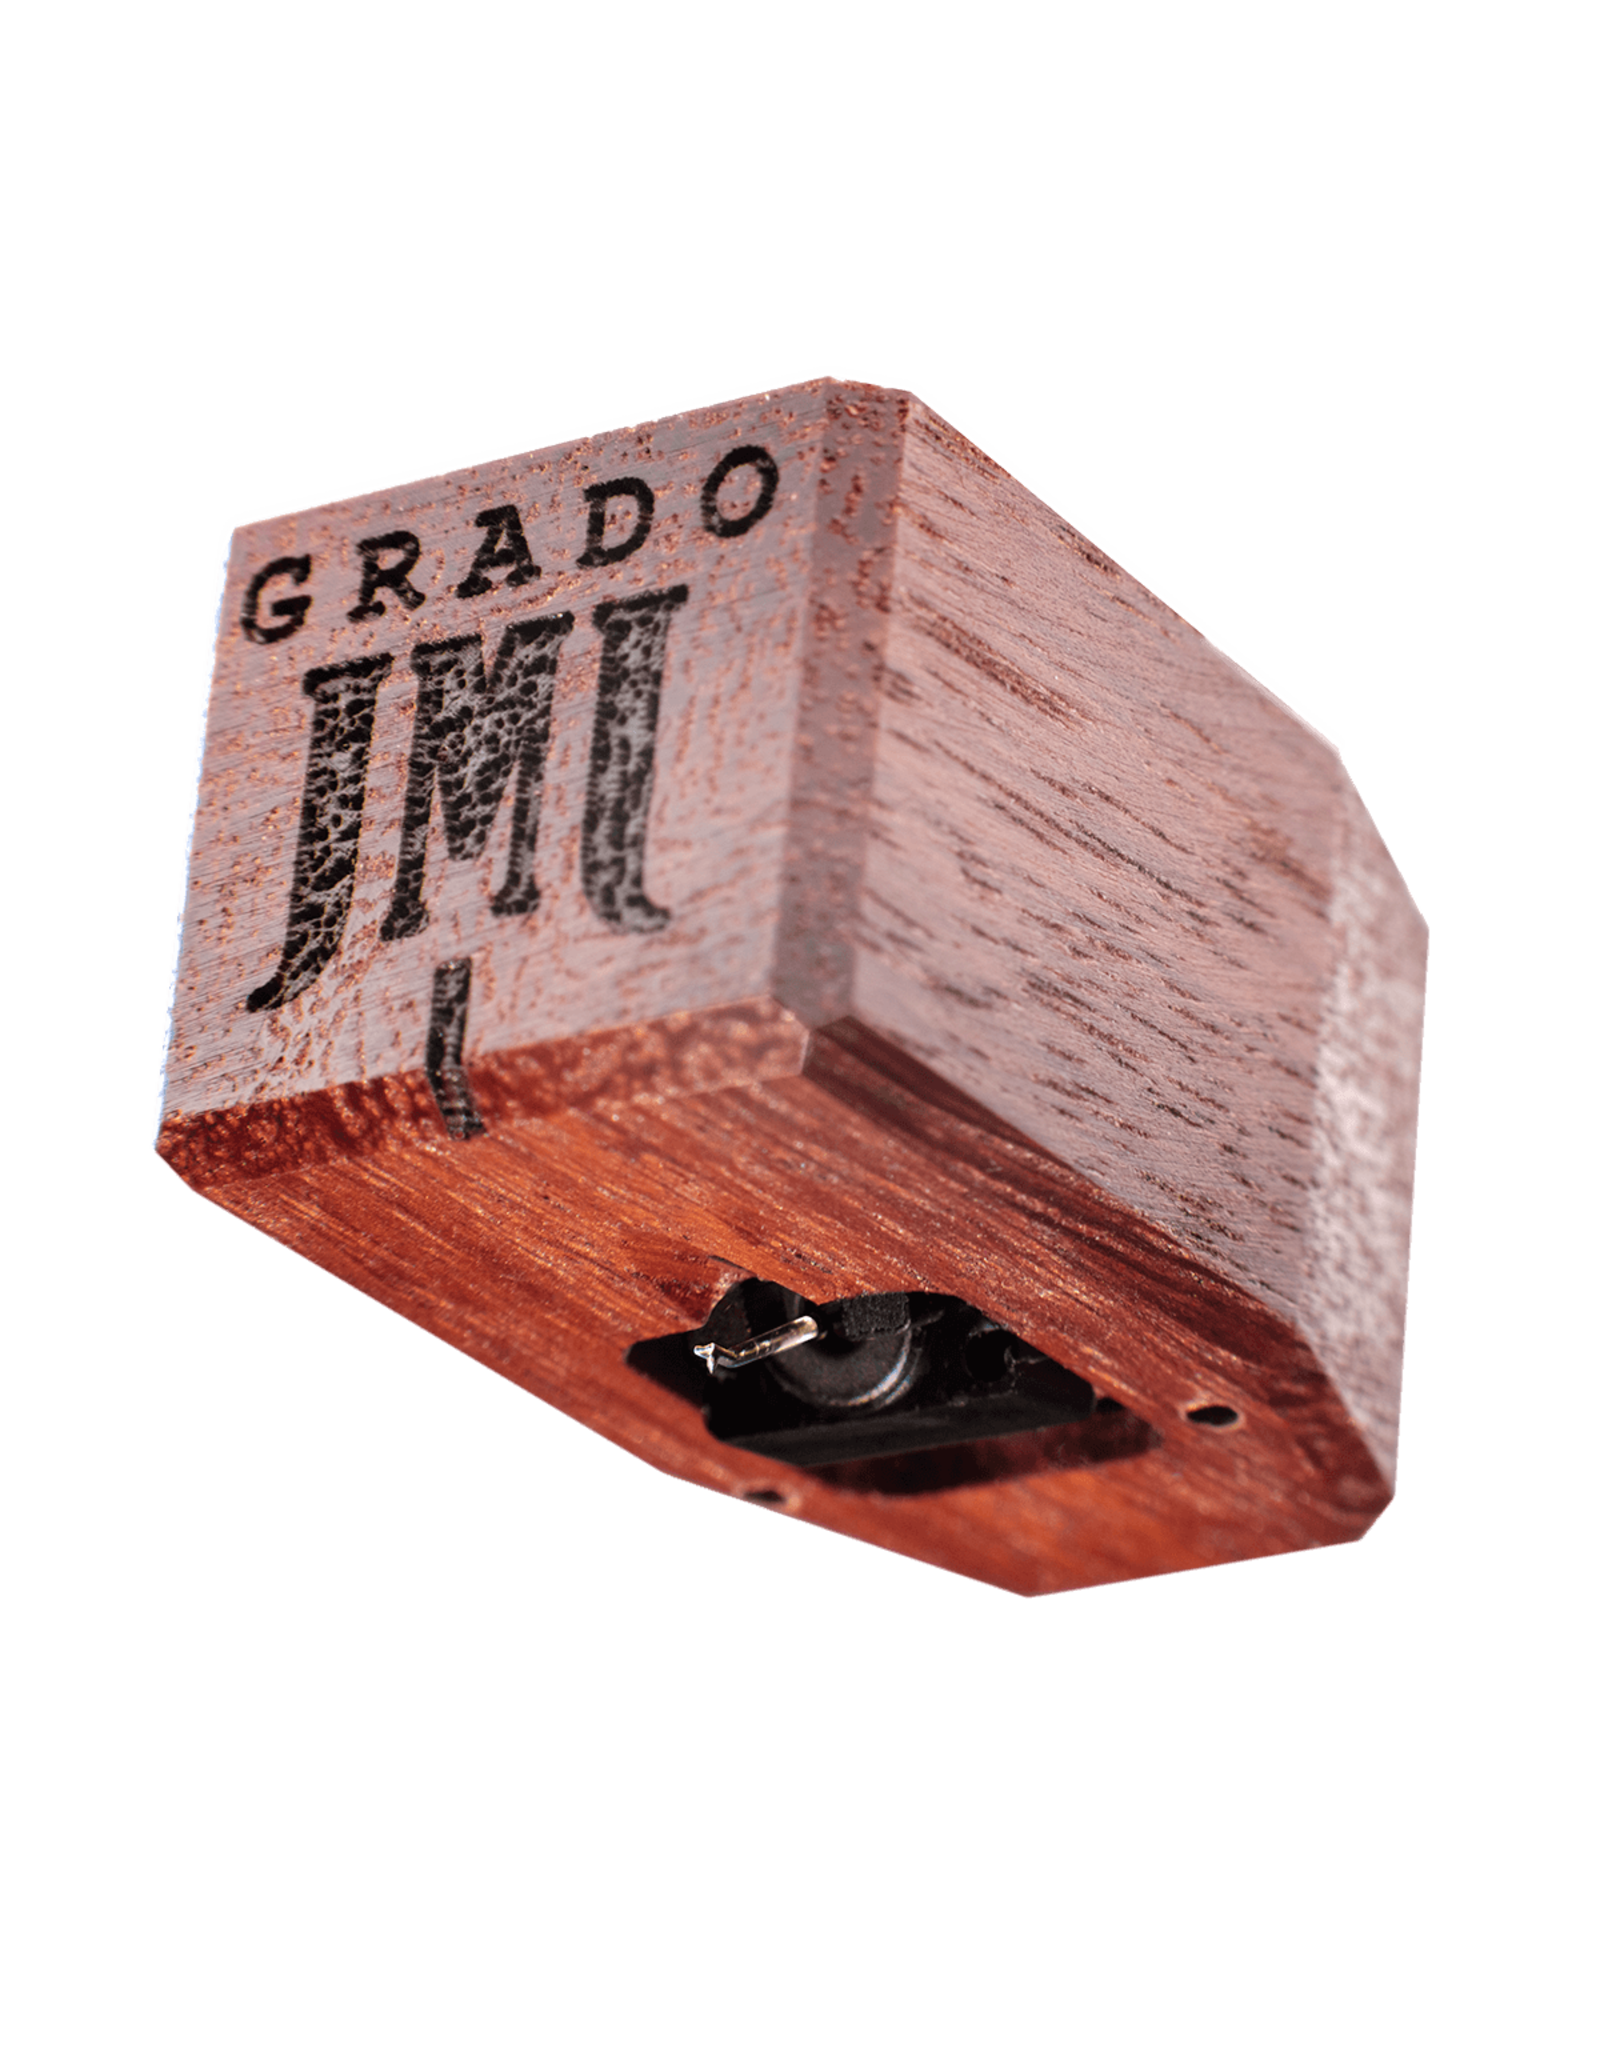 Grado Labs Grado Lineage Statement3 Phono Cartridge